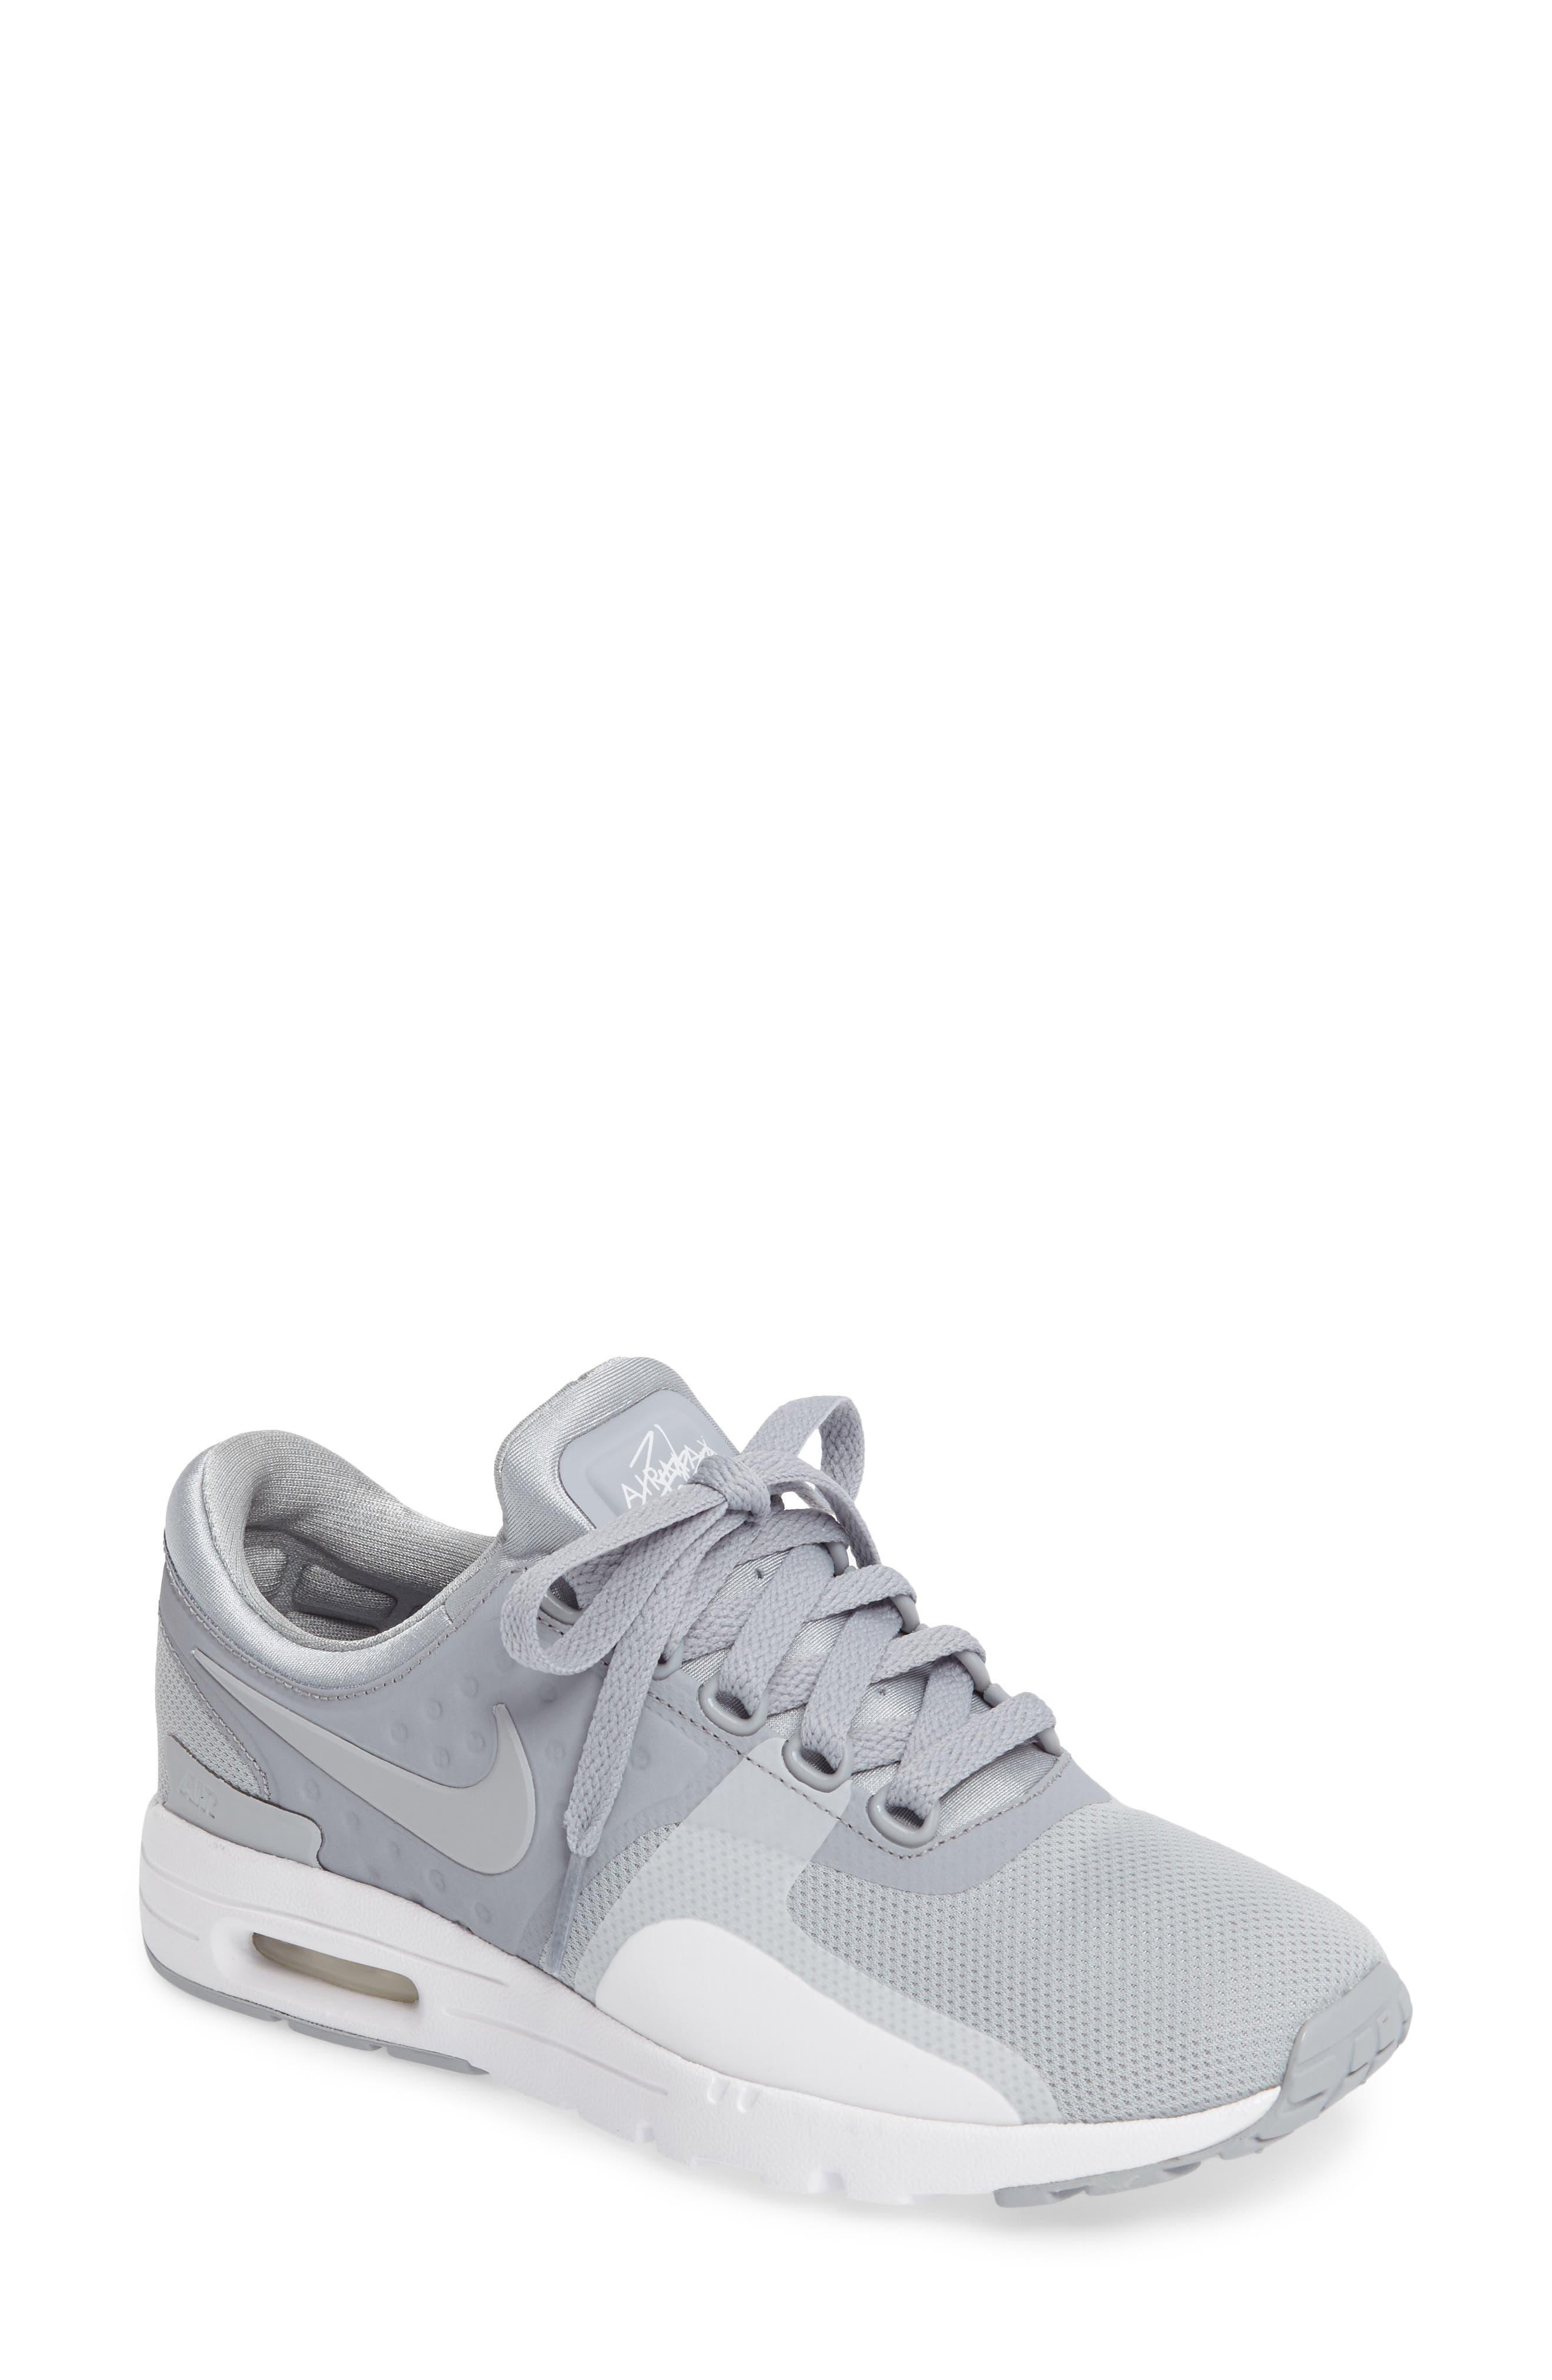 Air Max Zero Sneaker,                             Main thumbnail 1, color,                             020